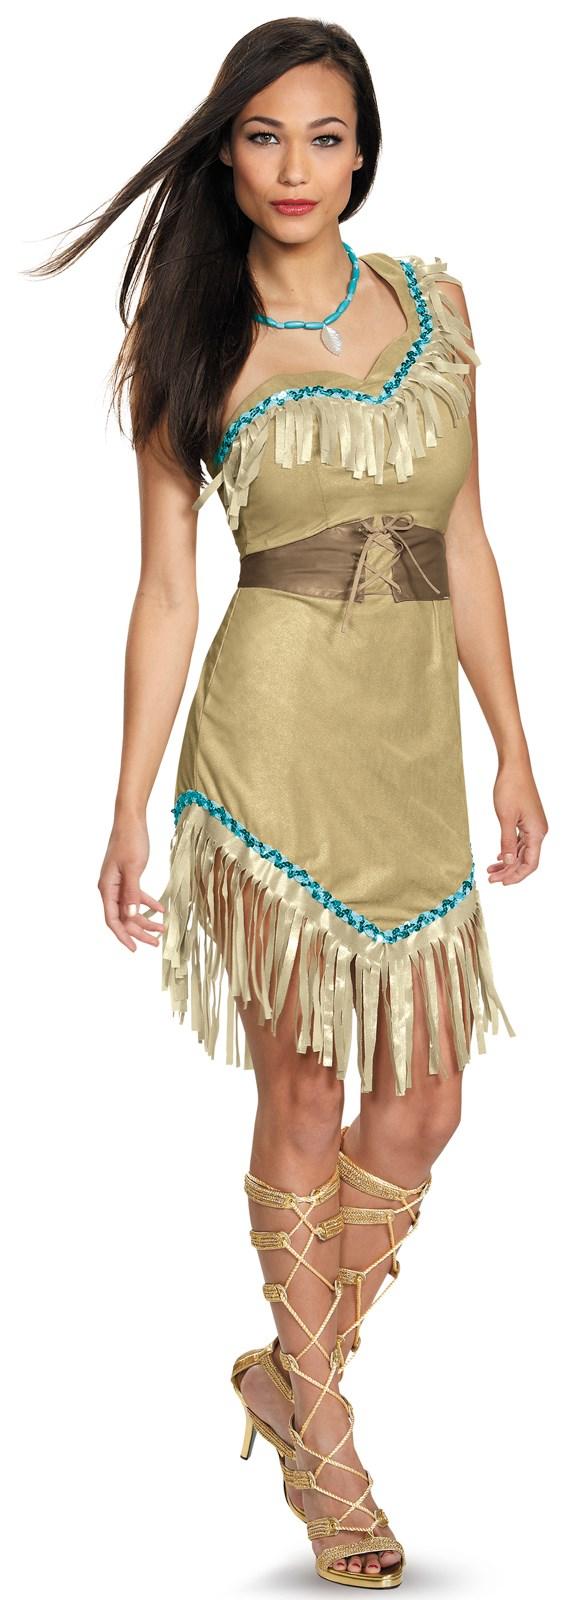 Disney Princess Deluxe Womens Pocahontas Costume | BuyCostumes.com